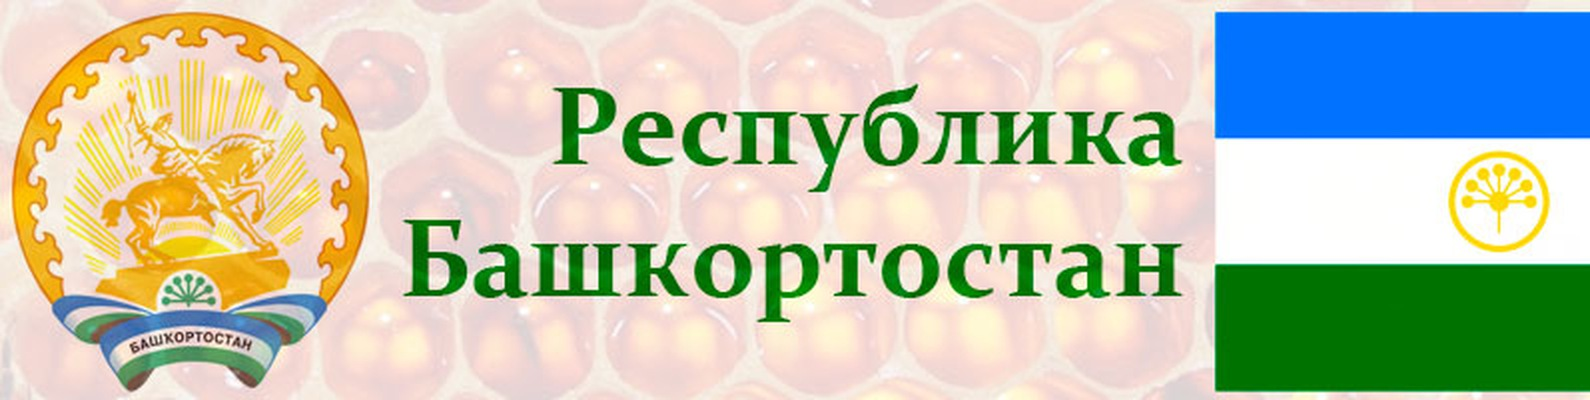 Картинка с надписью башкортостан